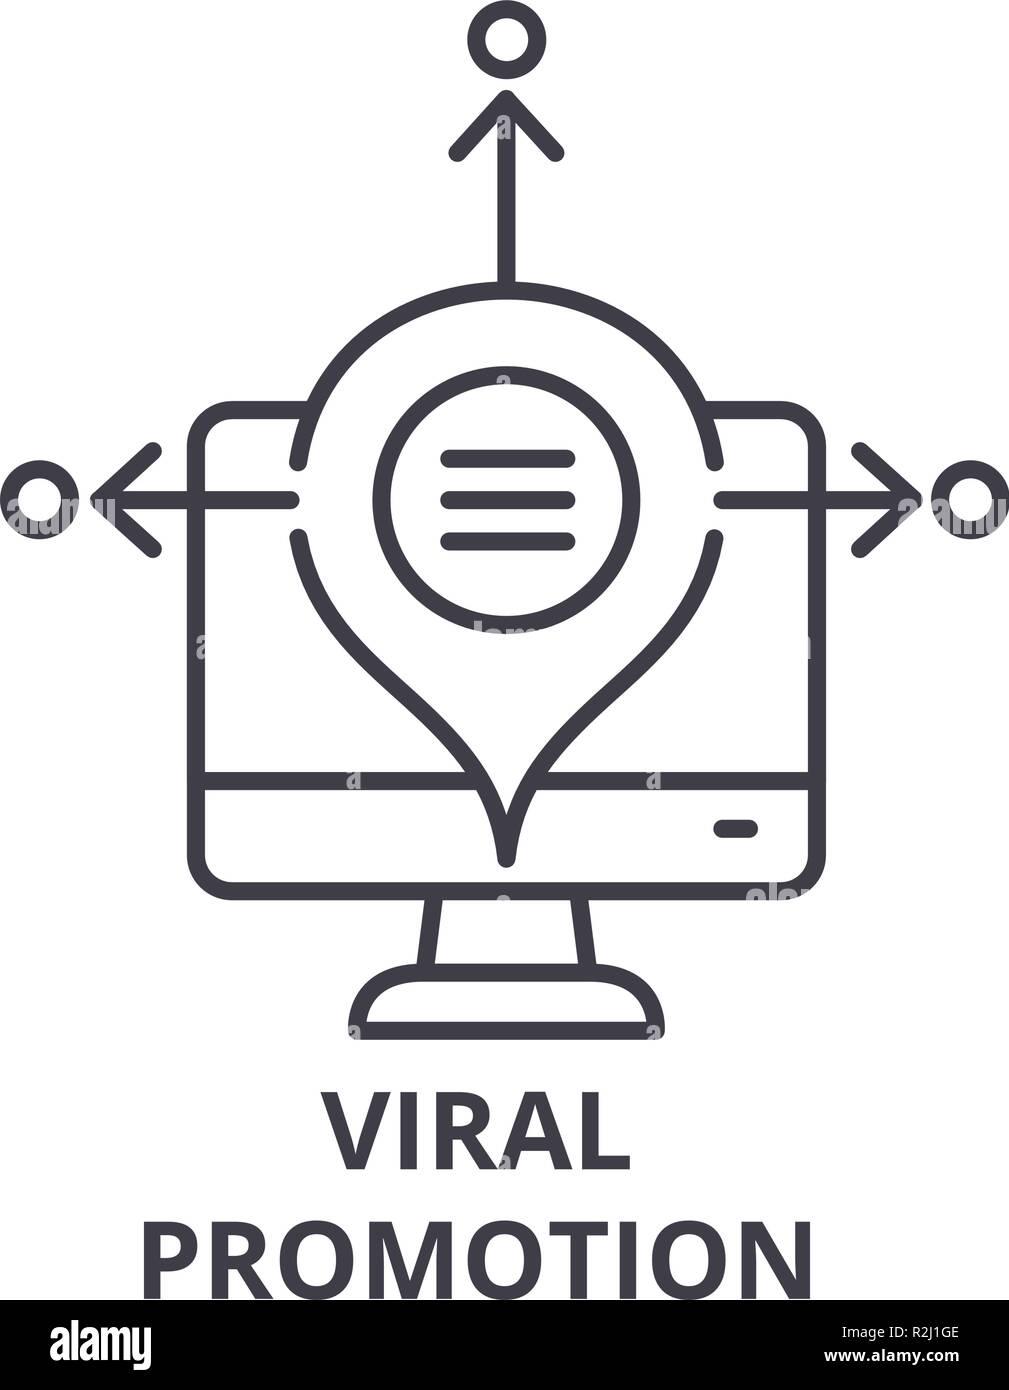 Viral promotion line icon concept. Viral promotion vector linear illustration, symbol, sign - Stock Image